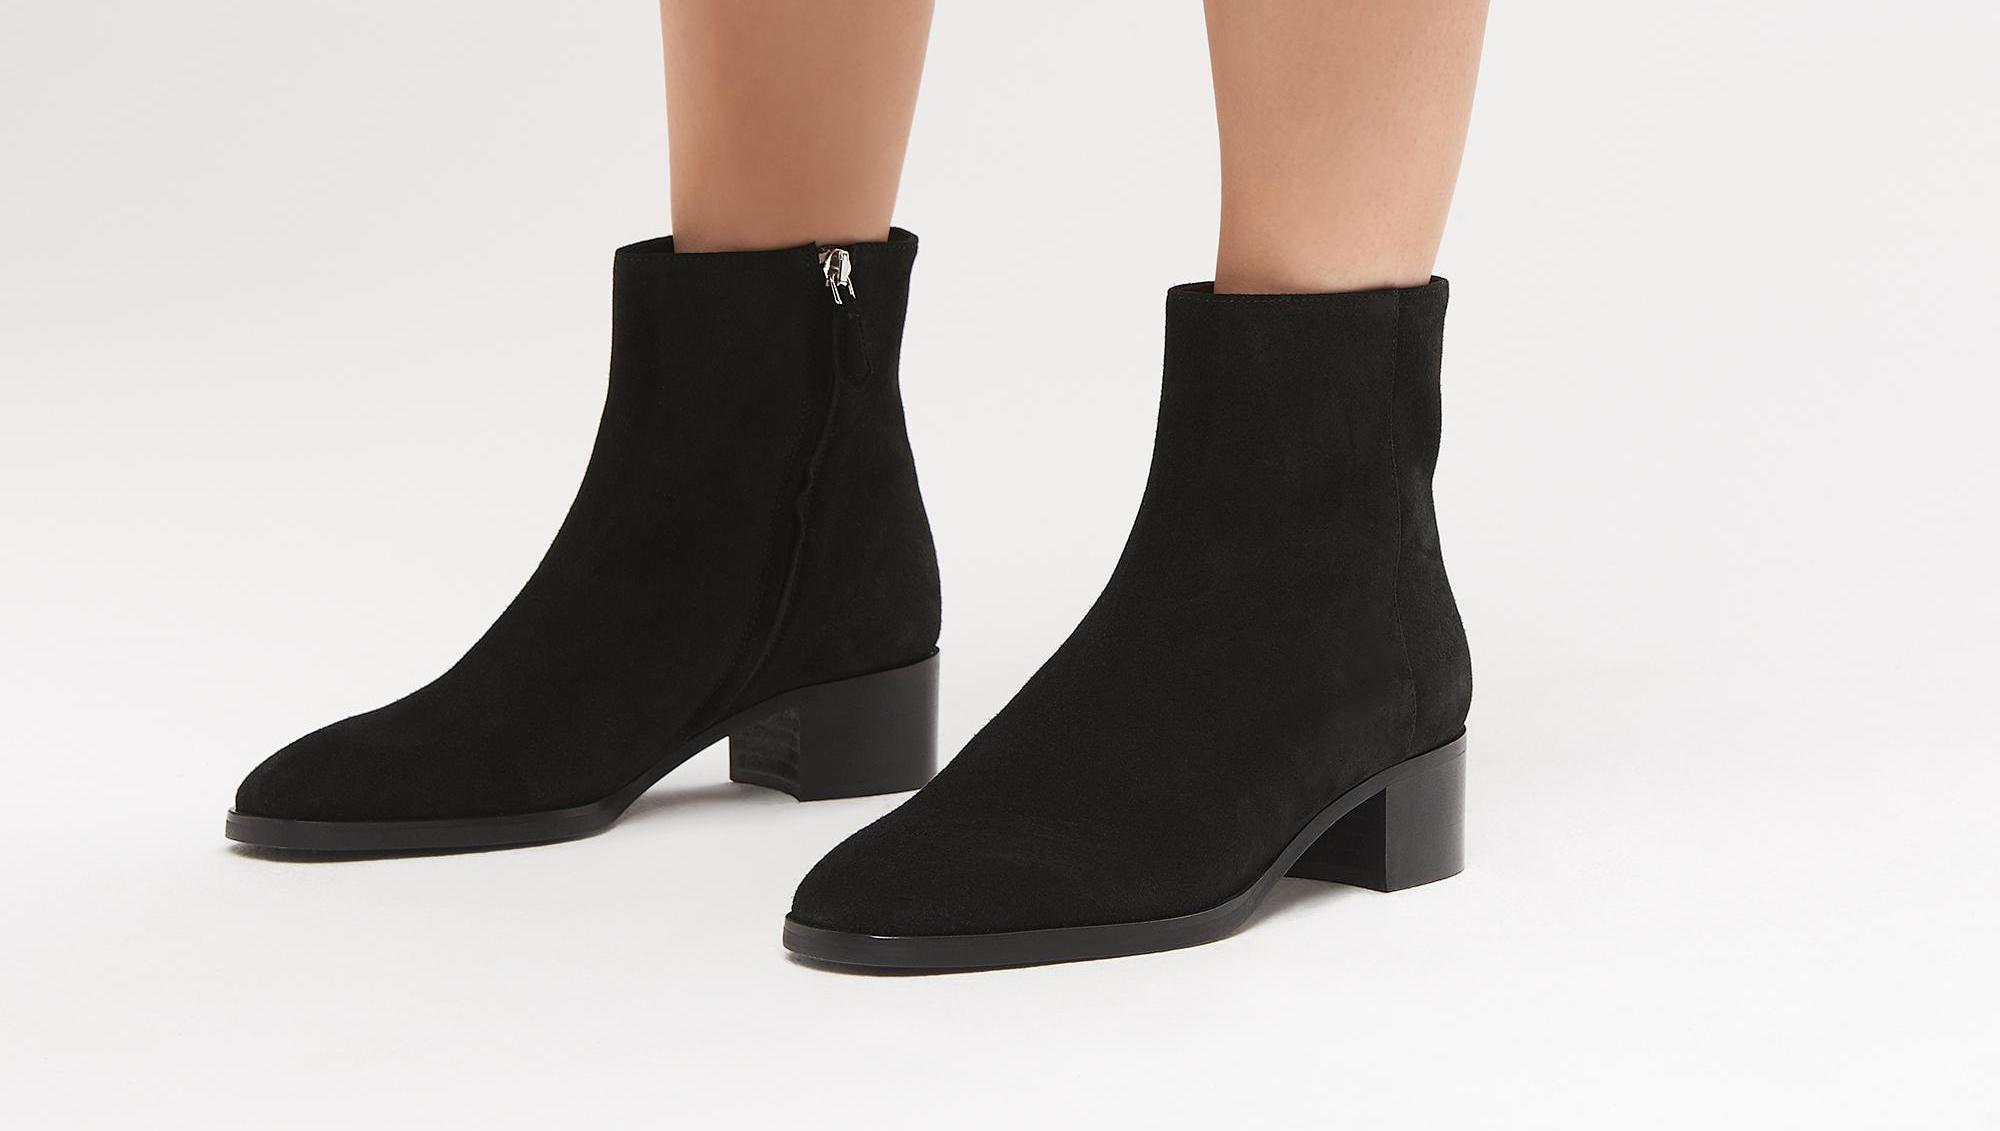 lk-bennett-ameli-boots